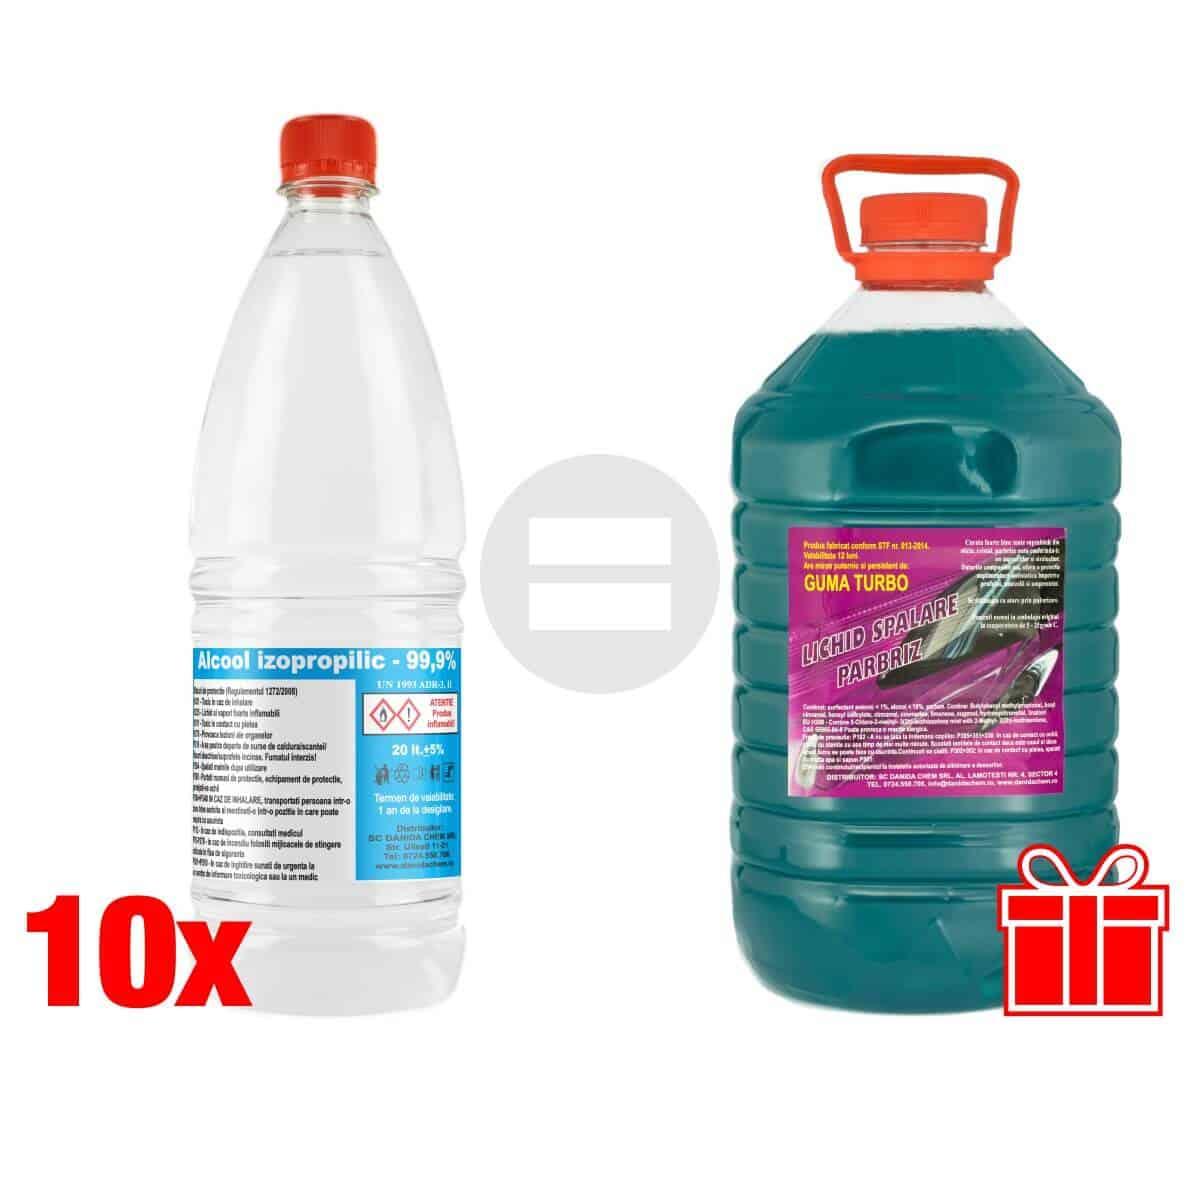 Pachet promotional 10 alcool izopropilic cadou solutie parbriz Danida Chem